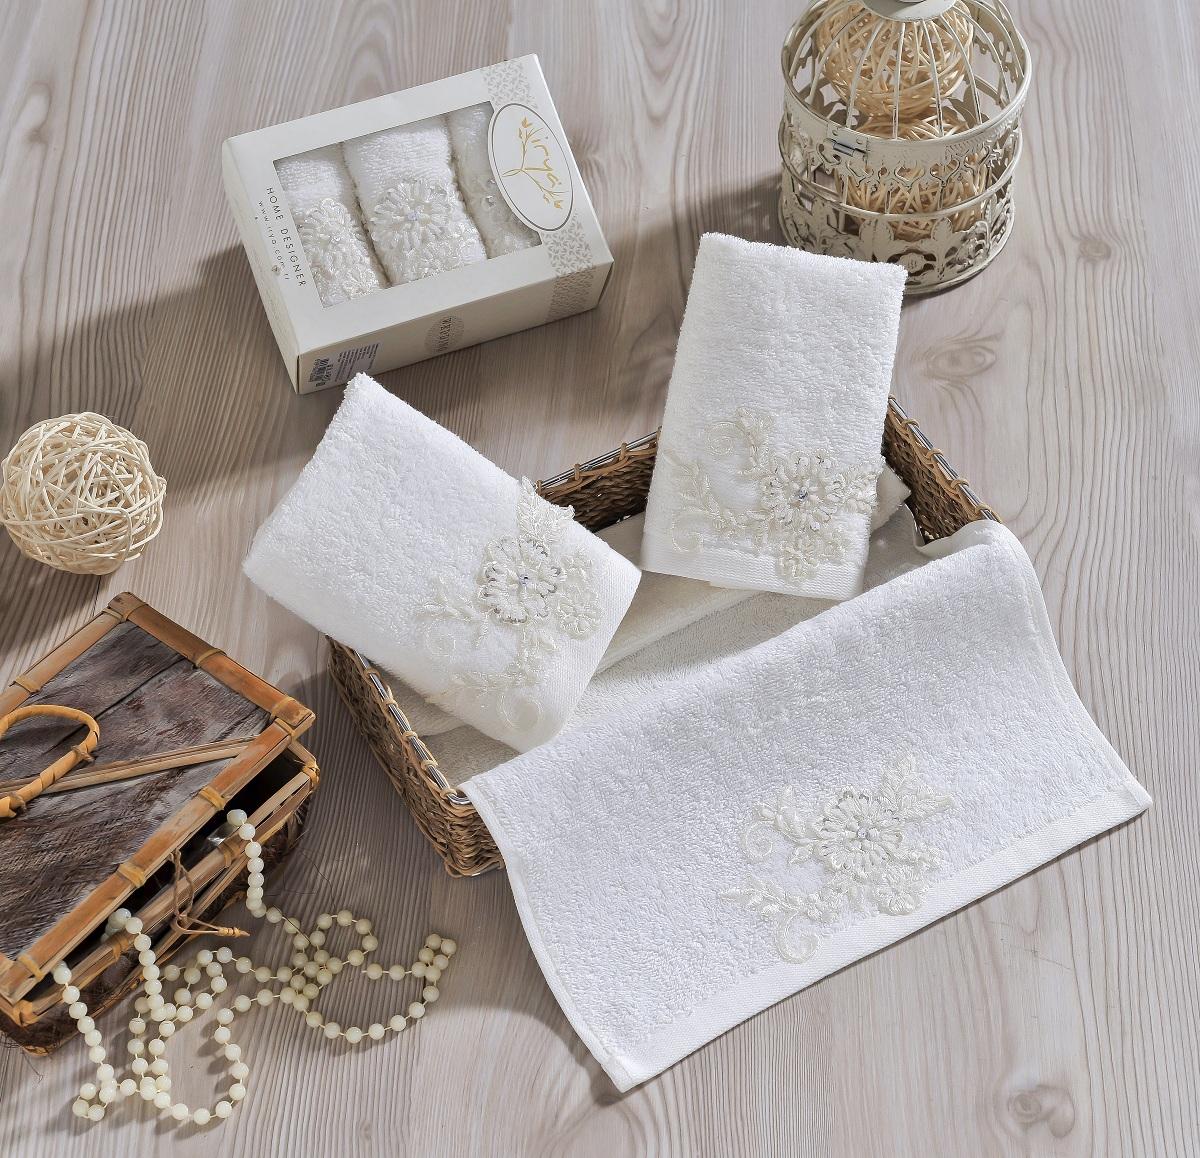 Полотенца IRYA Полотенце Actuel Цвет: Молочный (30х50 см - 3 шт) полотенца банные spasilk полотенце 3 шт